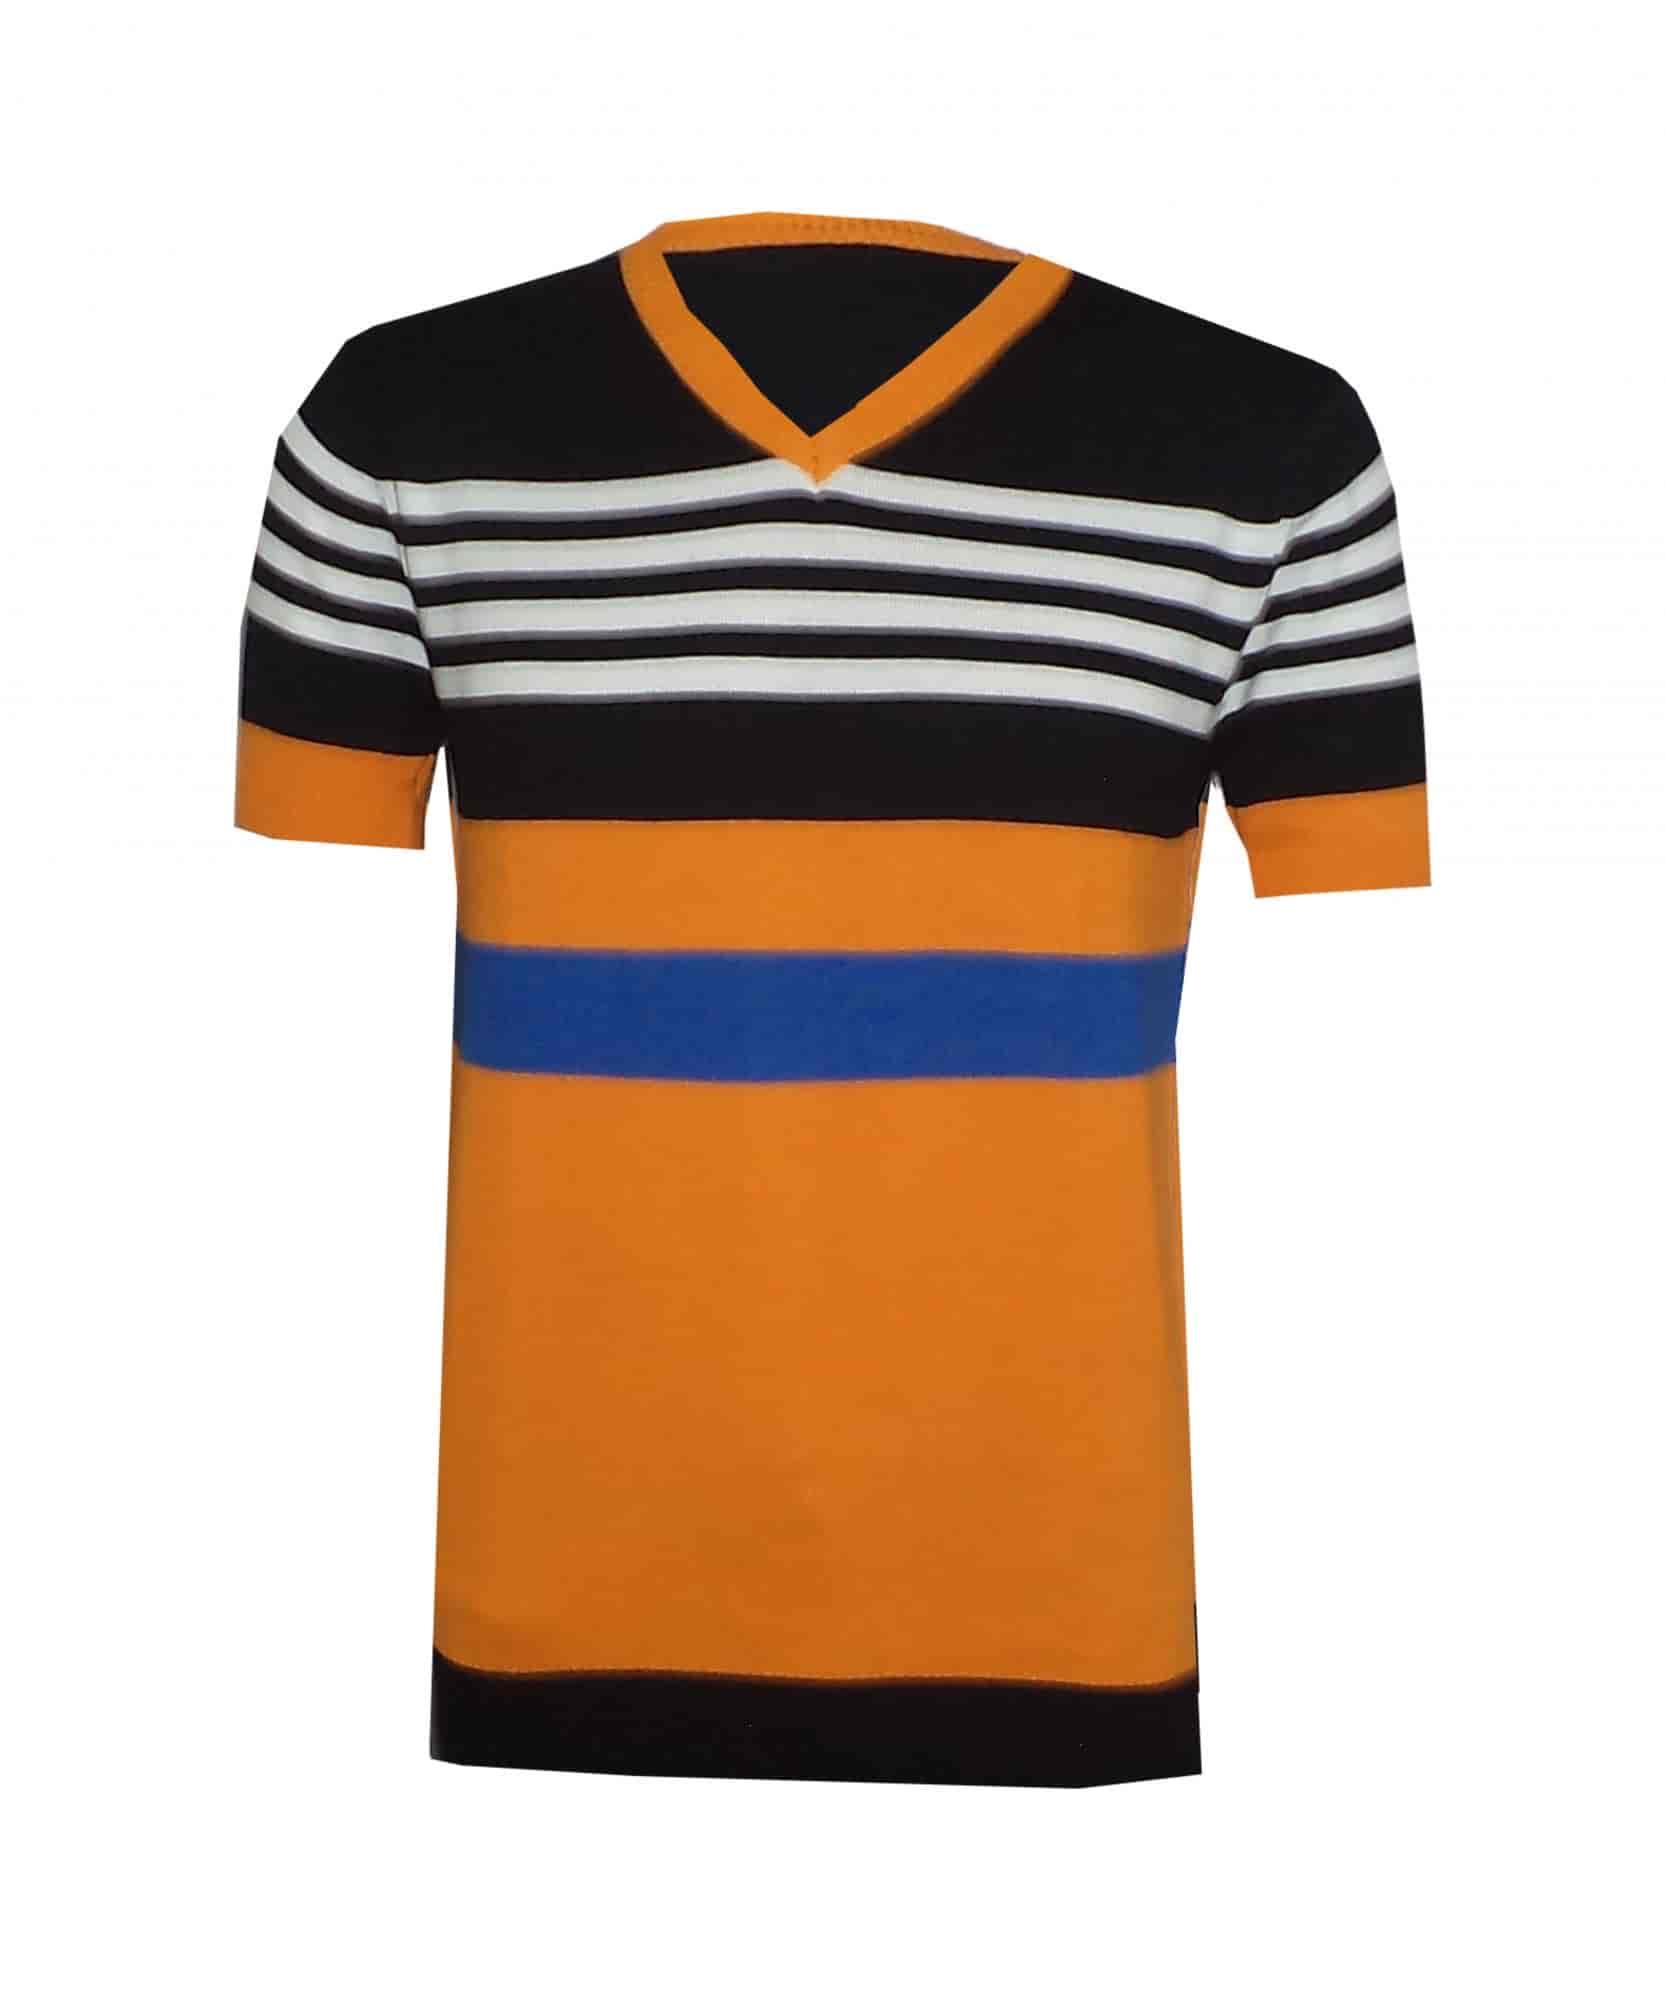 active apparel brands aryan apparels pvt ltd